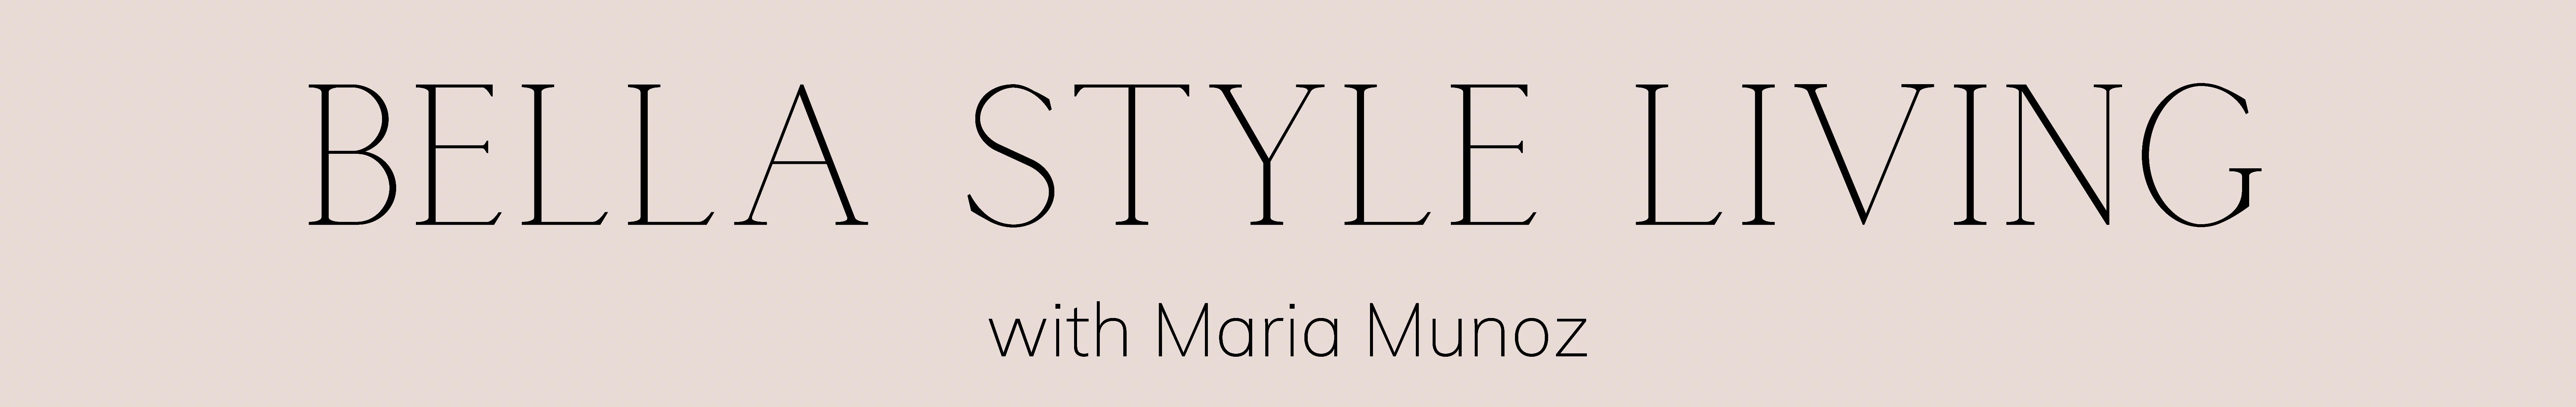 Bella Style Living